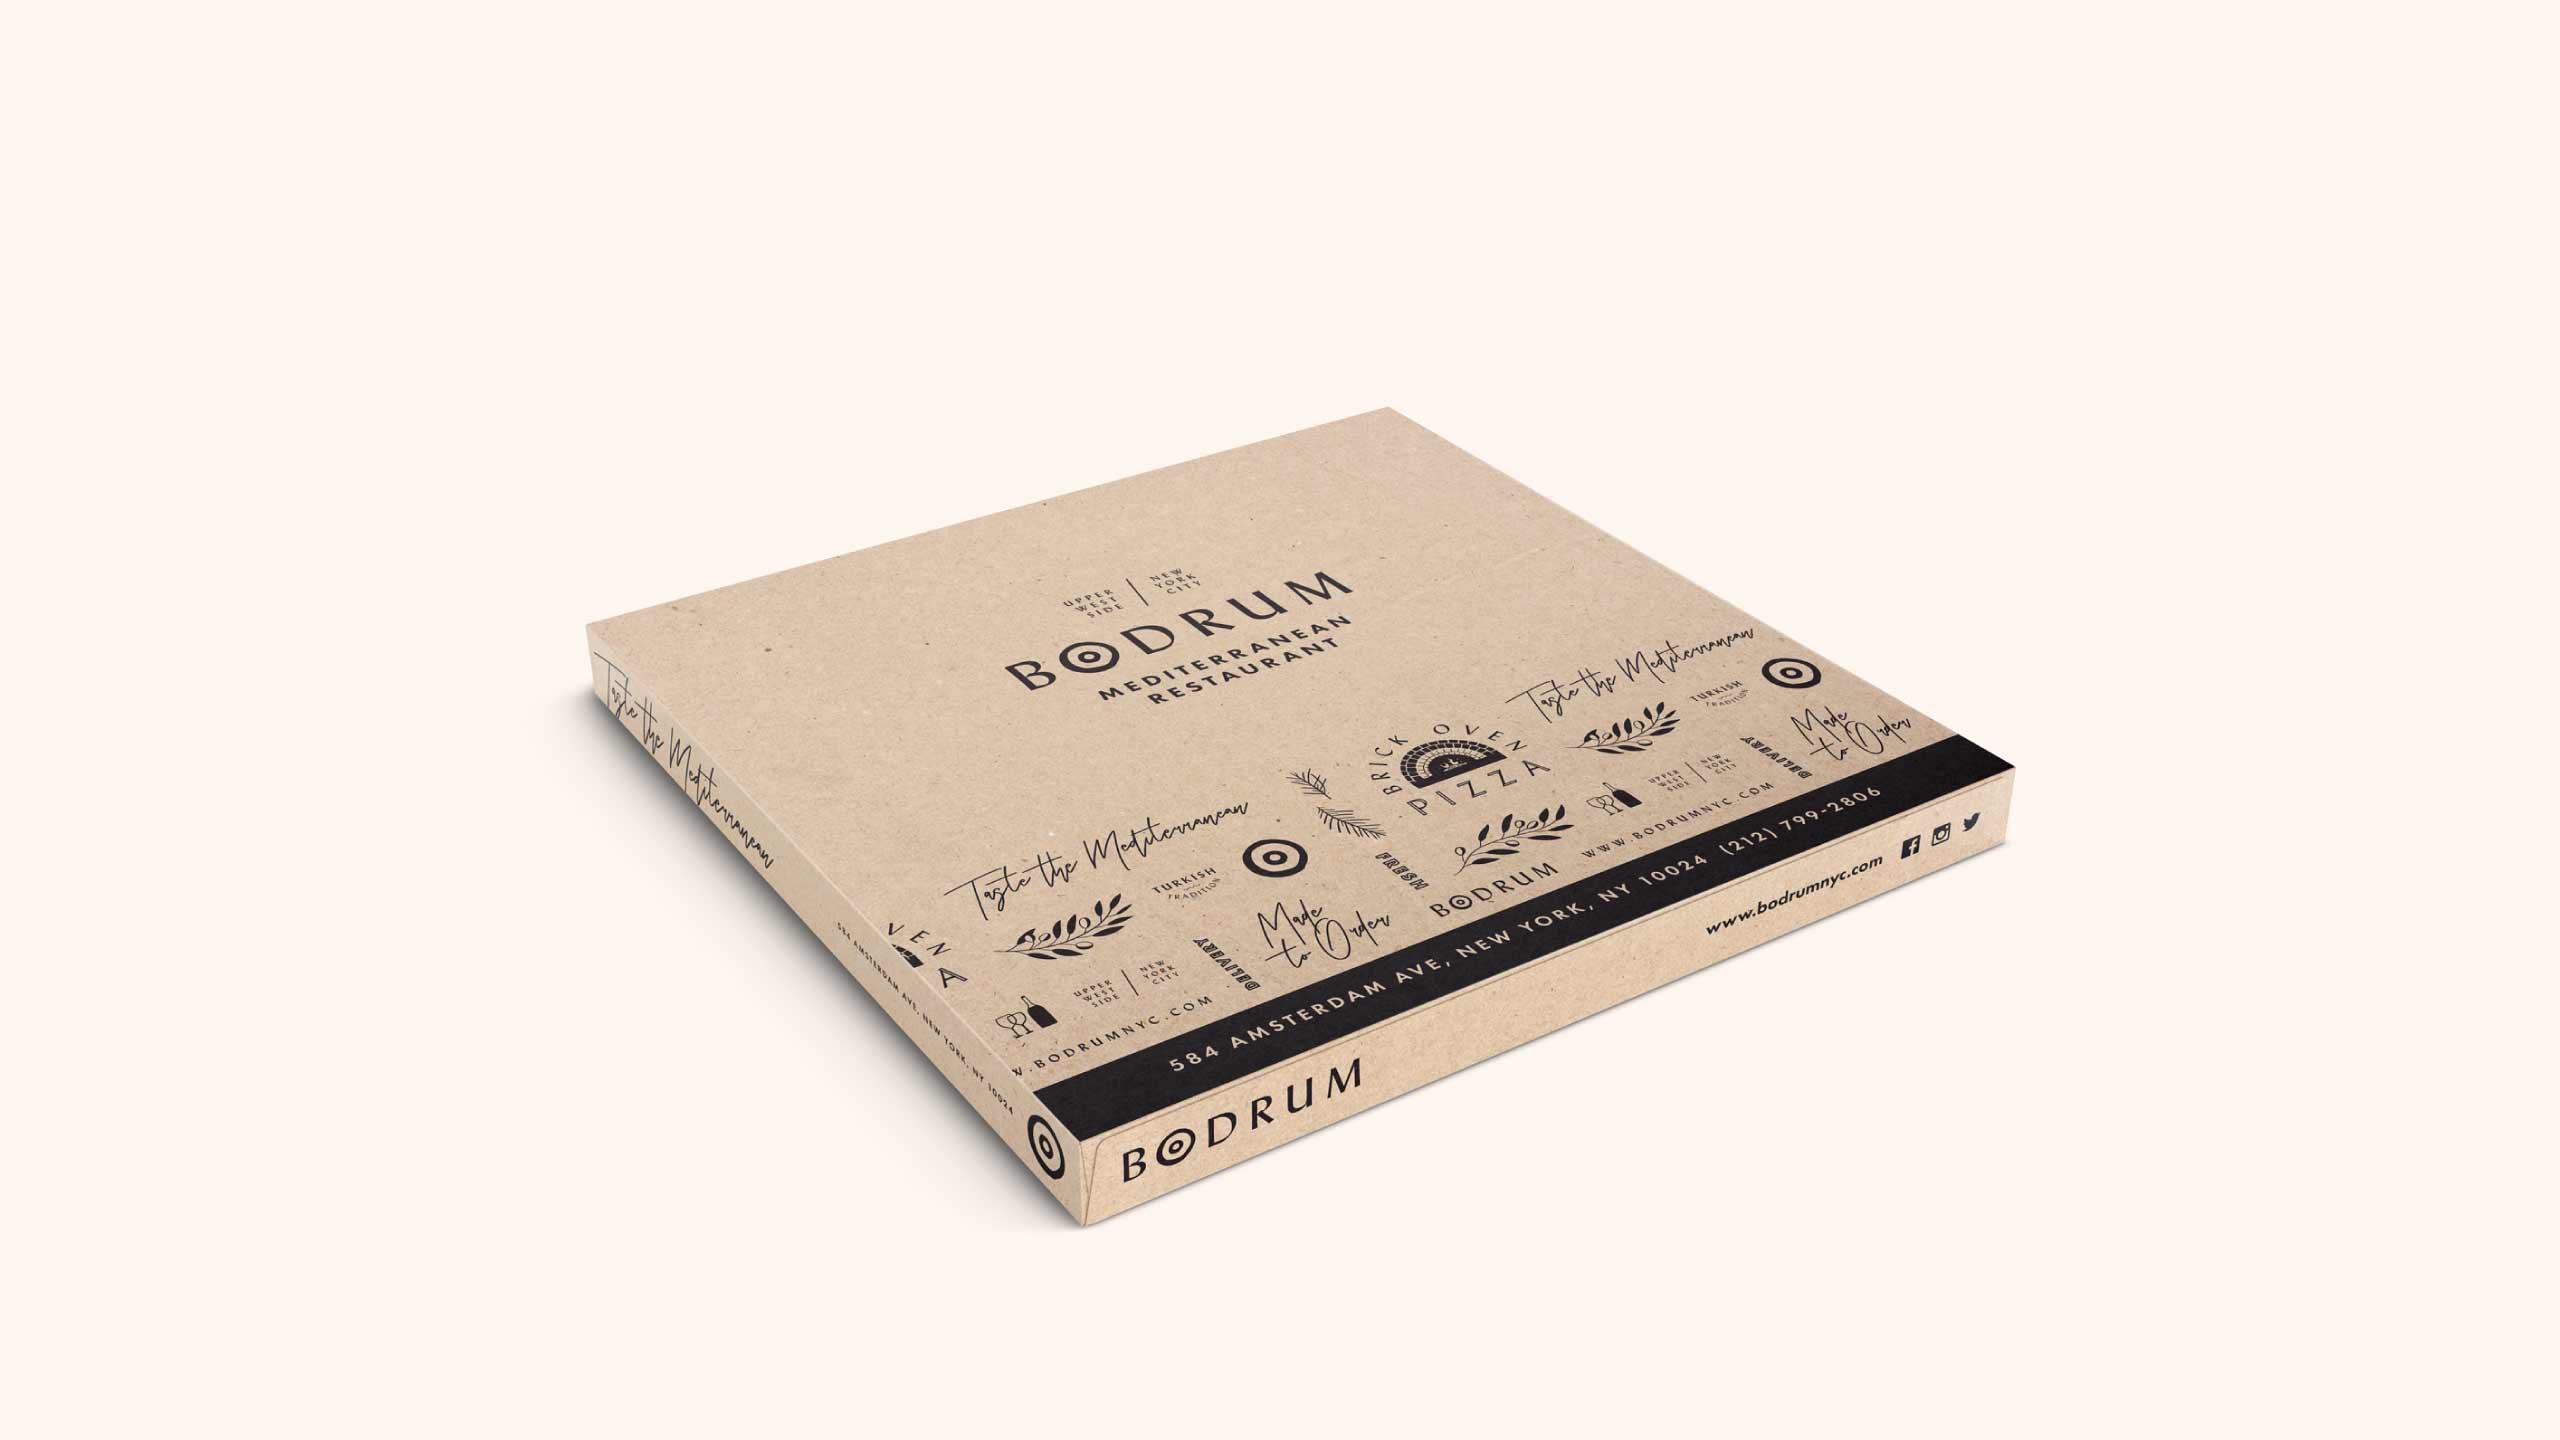 bodrum-packaging-design-02